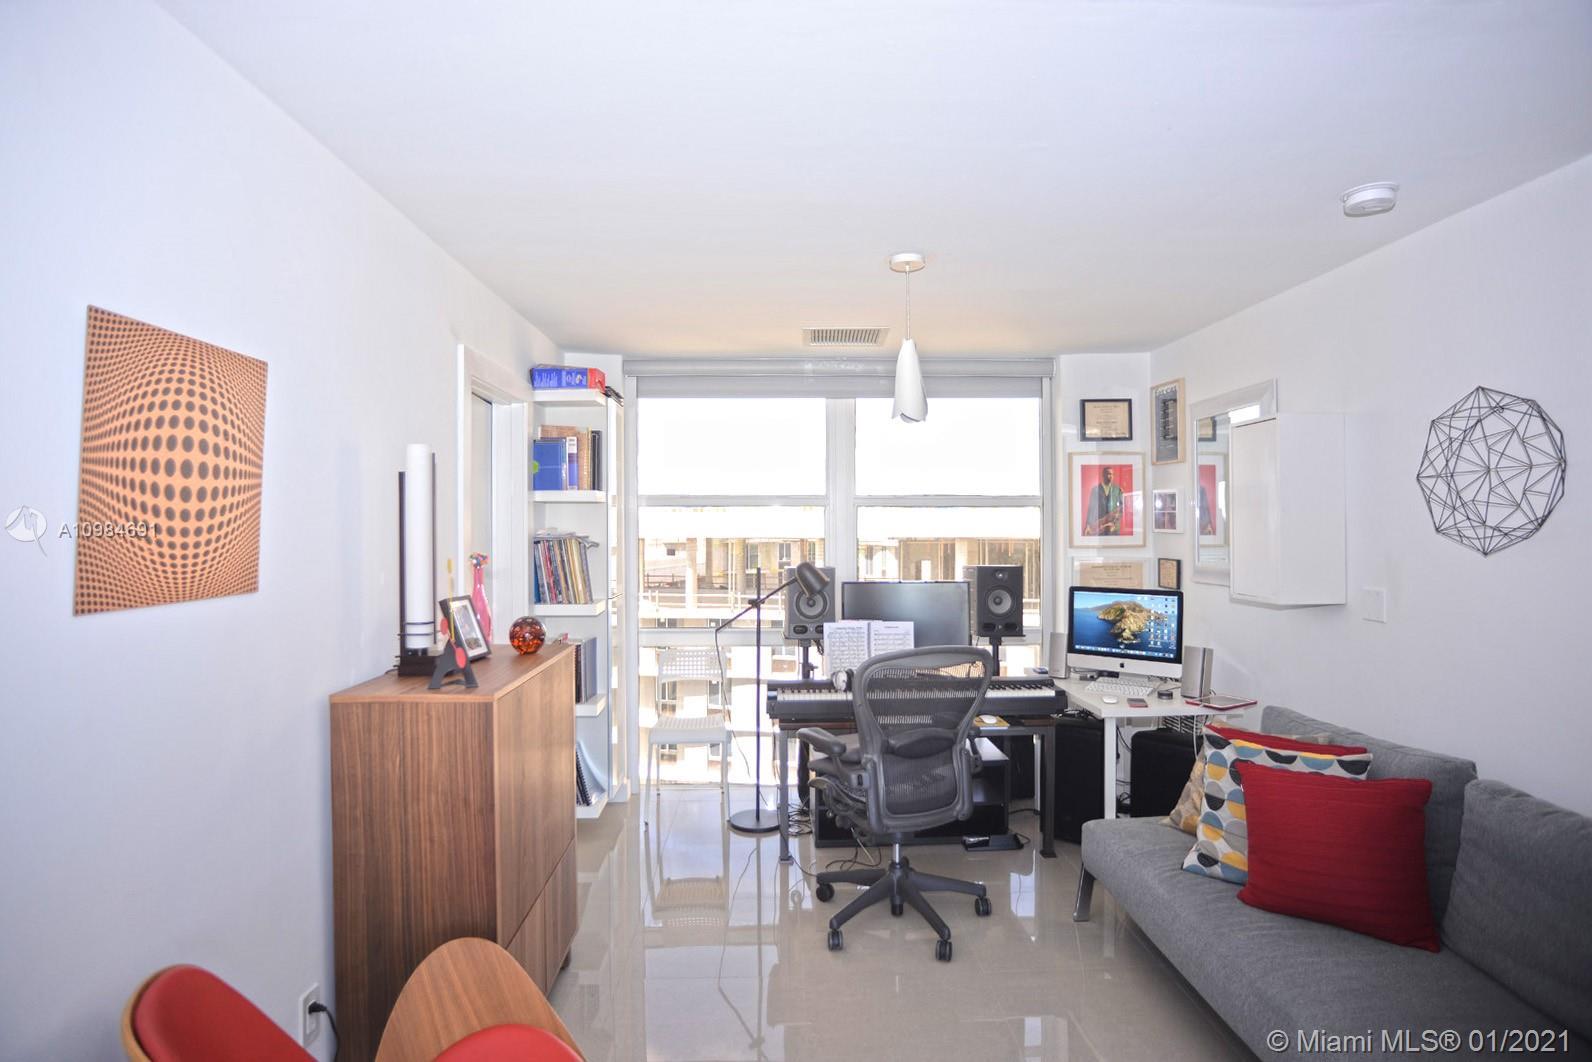 5701 Biscayne Blvd, Miami, Florida 33137, 1 Bedroom Bedrooms, ,2 BathroomsBathrooms,Residential,For Sale,5701 Biscayne Blvd,A10984691